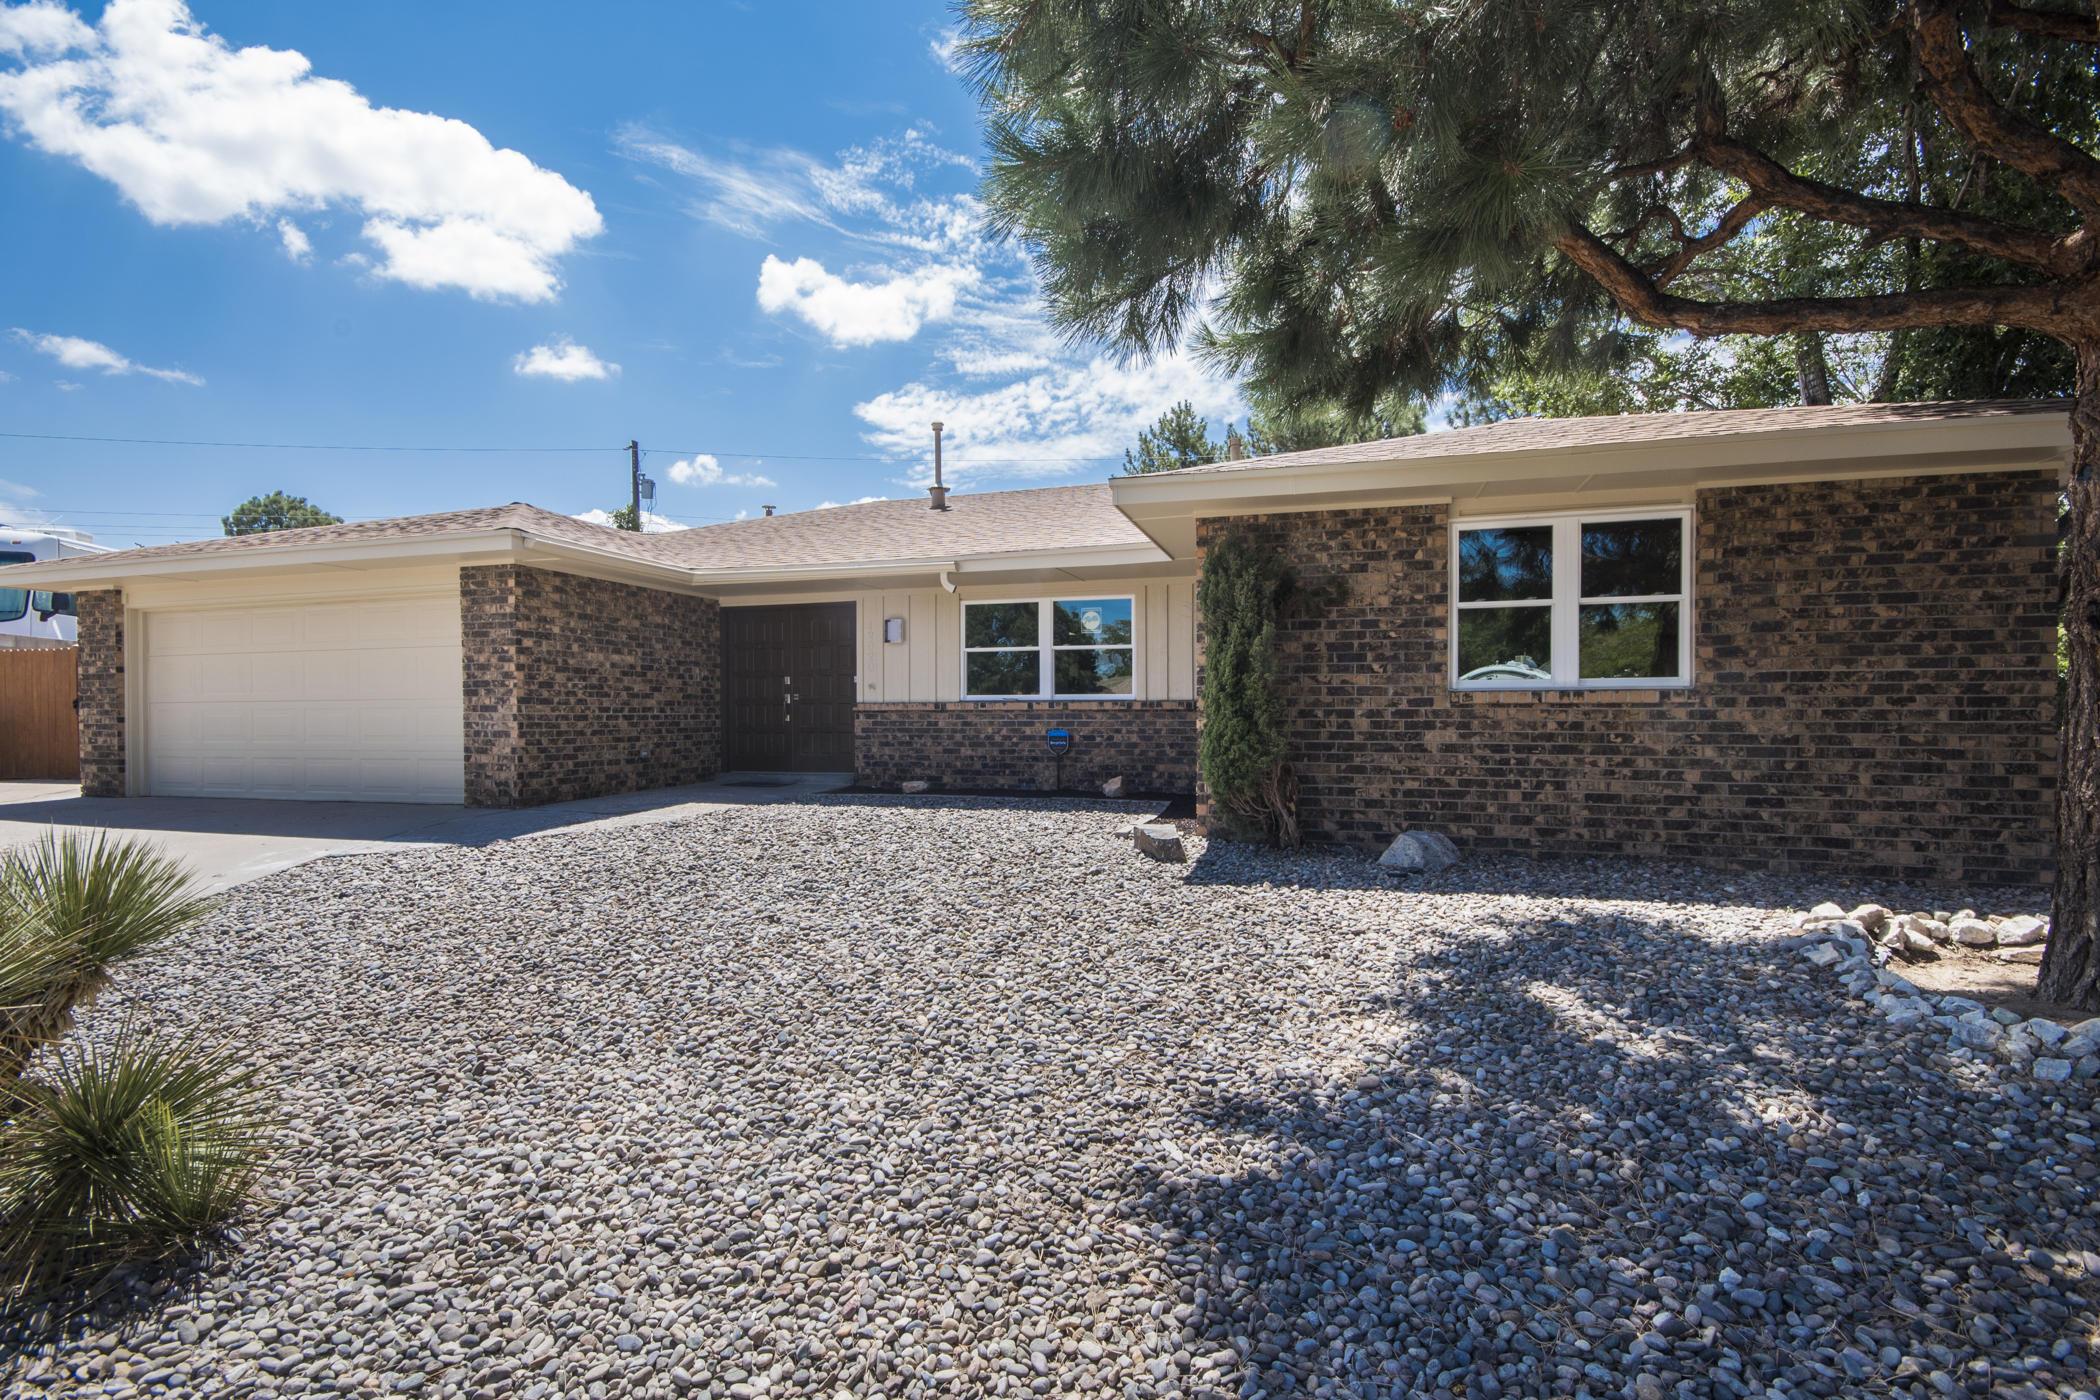 12020 DONNA Court NE Property Photo - Albuquerque, NM real estate listing